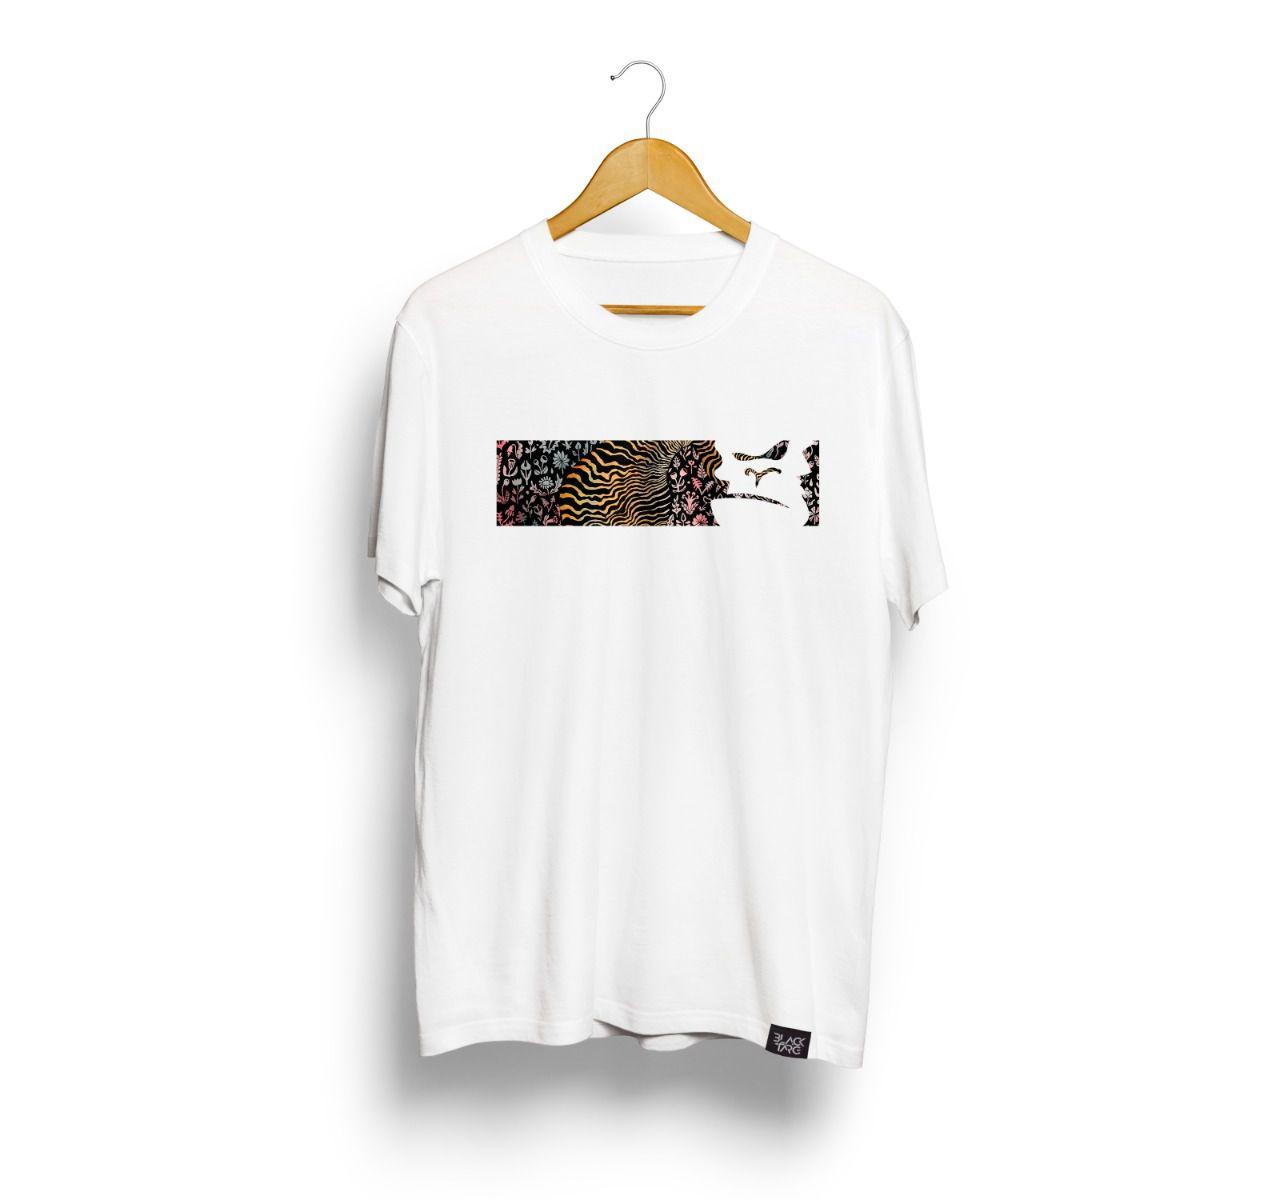 Camiseta Masculina Estampa Animal Print